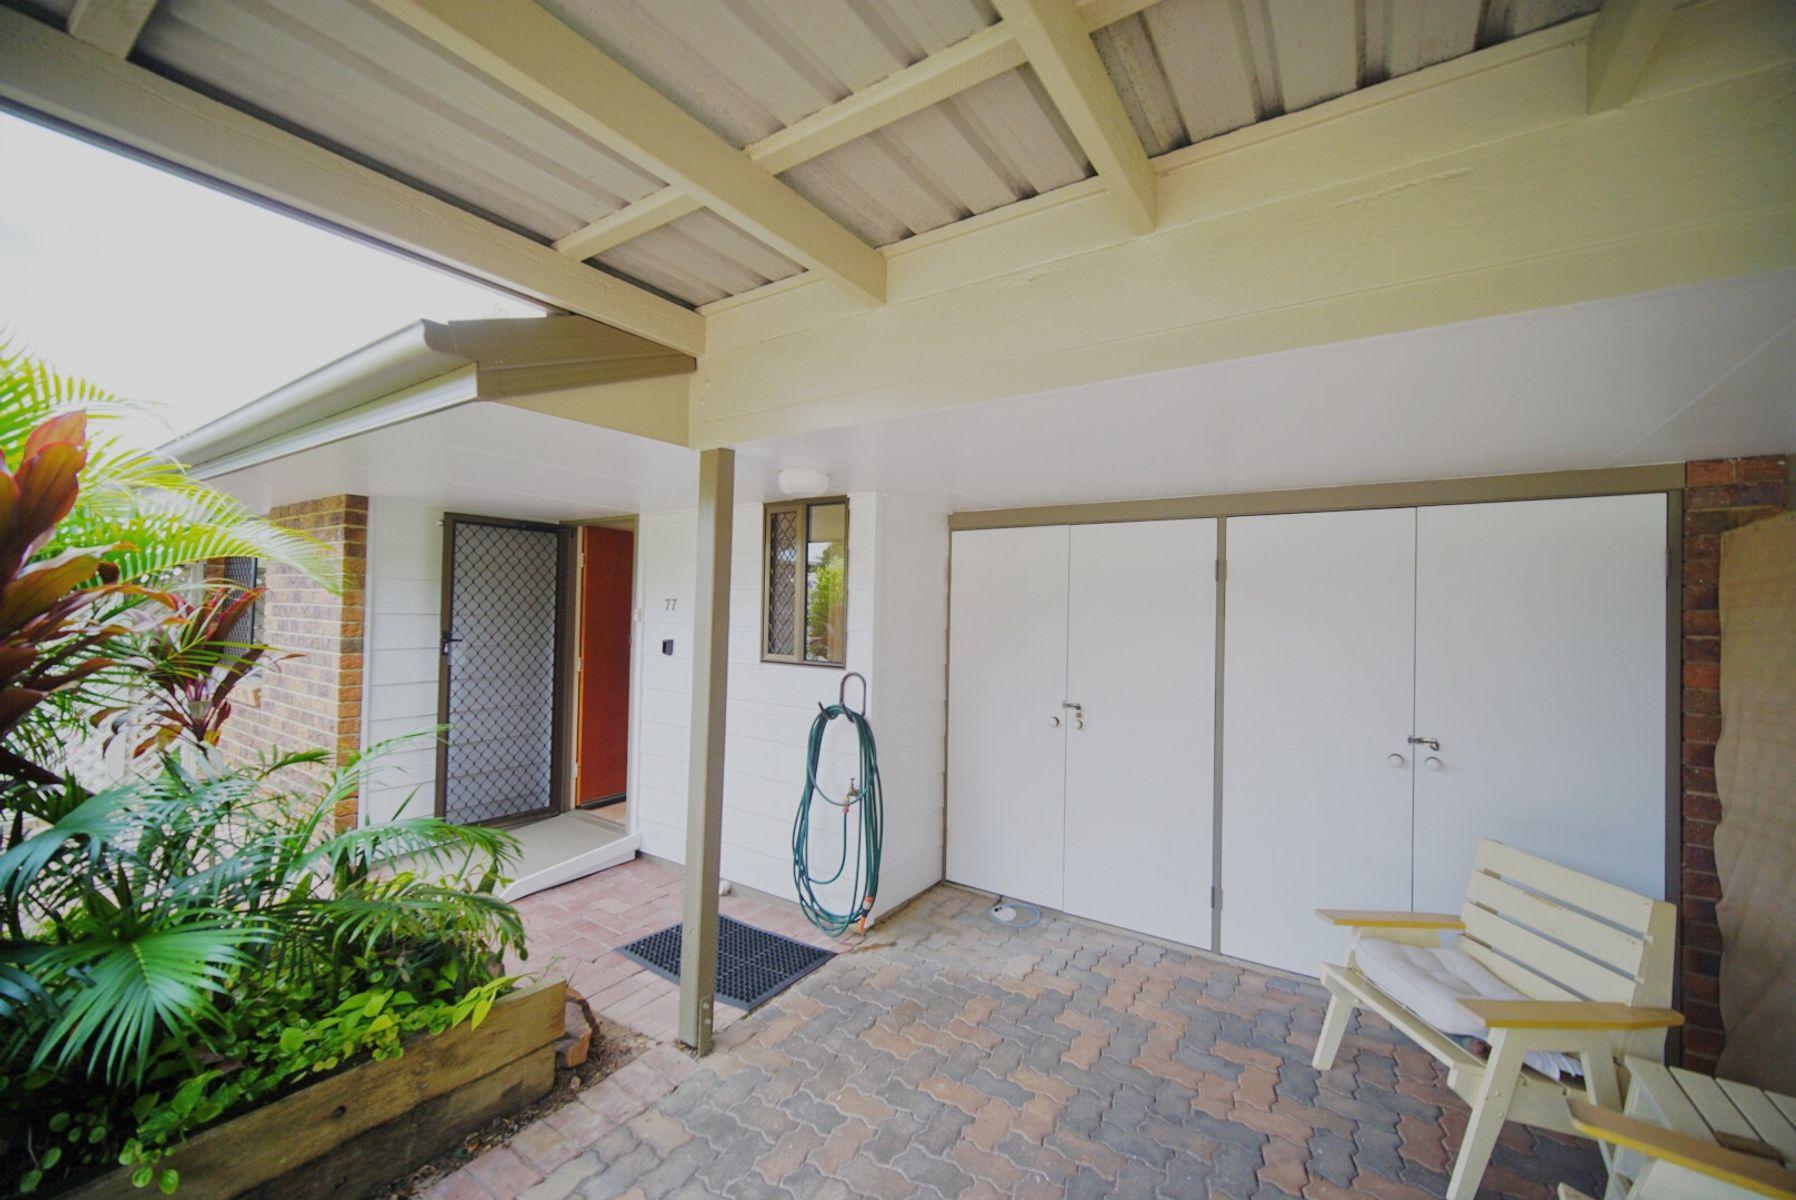 77/18 Doolan Street, Nambour, QLD 4560